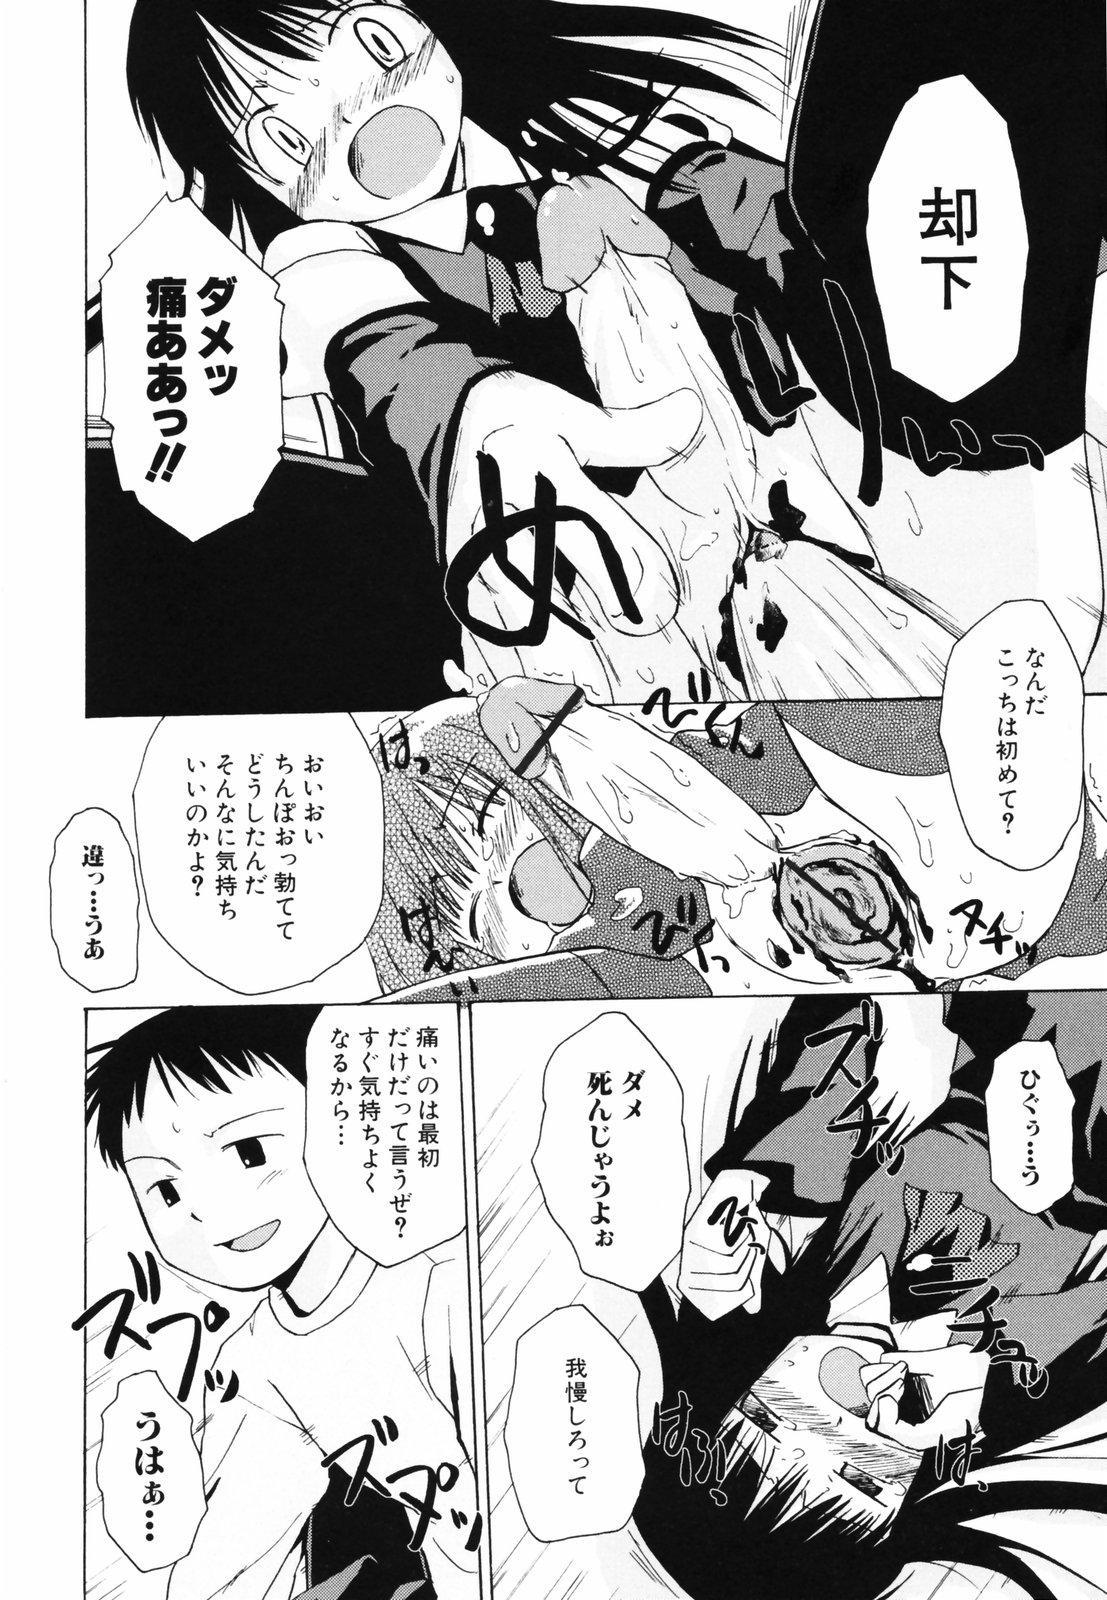 Hanjuku Shoujo 98